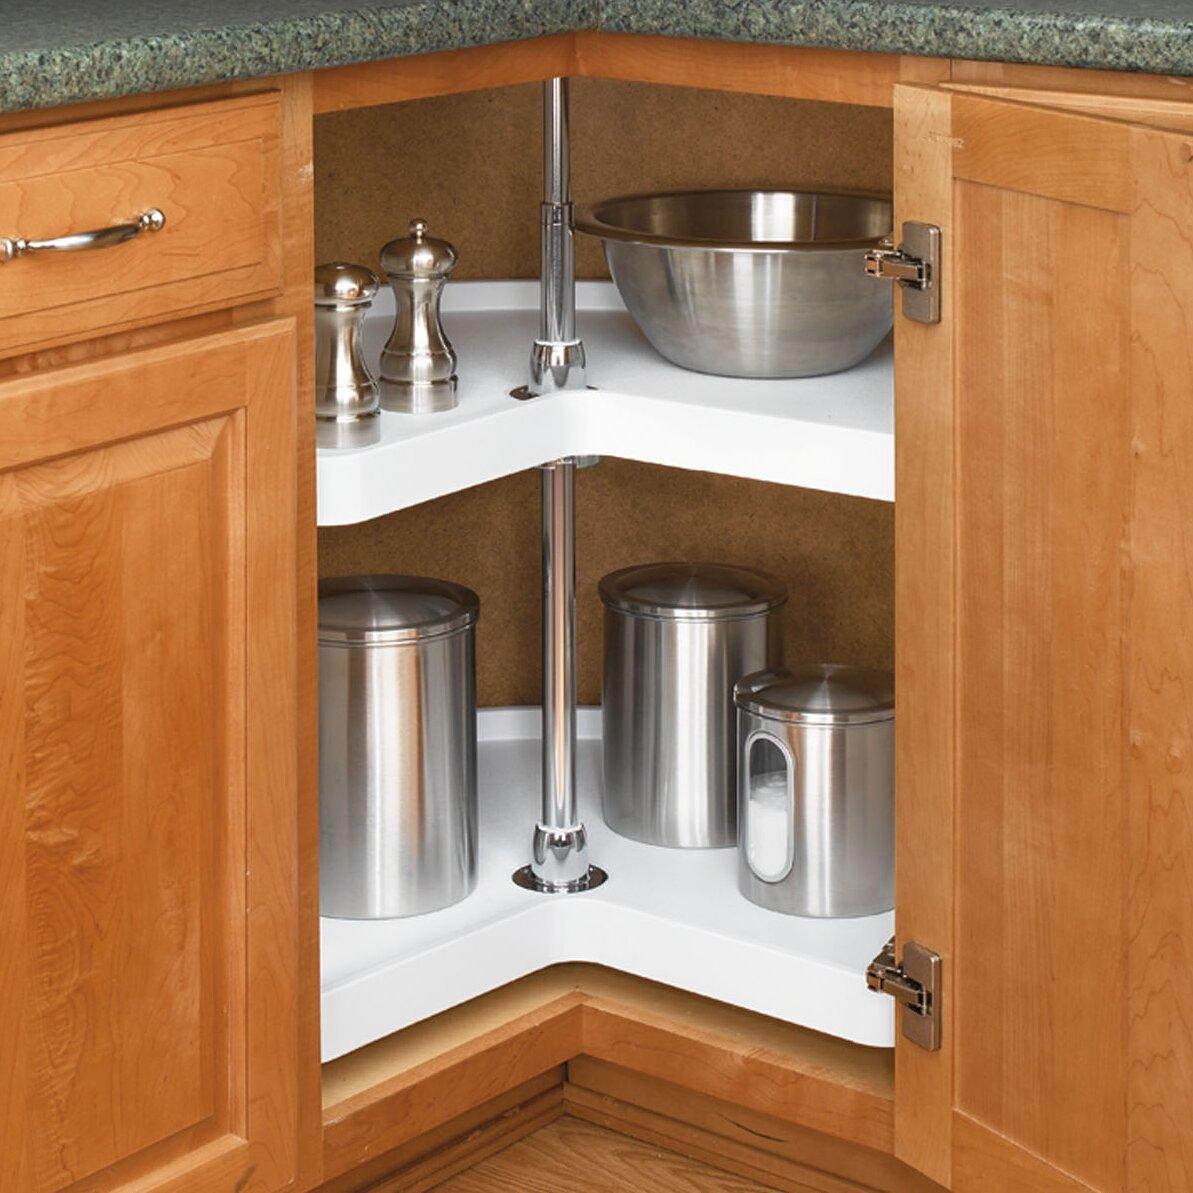 rev a shelf kidney 32 2 shelf lazy susan reviews wayfair. Black Bedroom Furniture Sets. Home Design Ideas